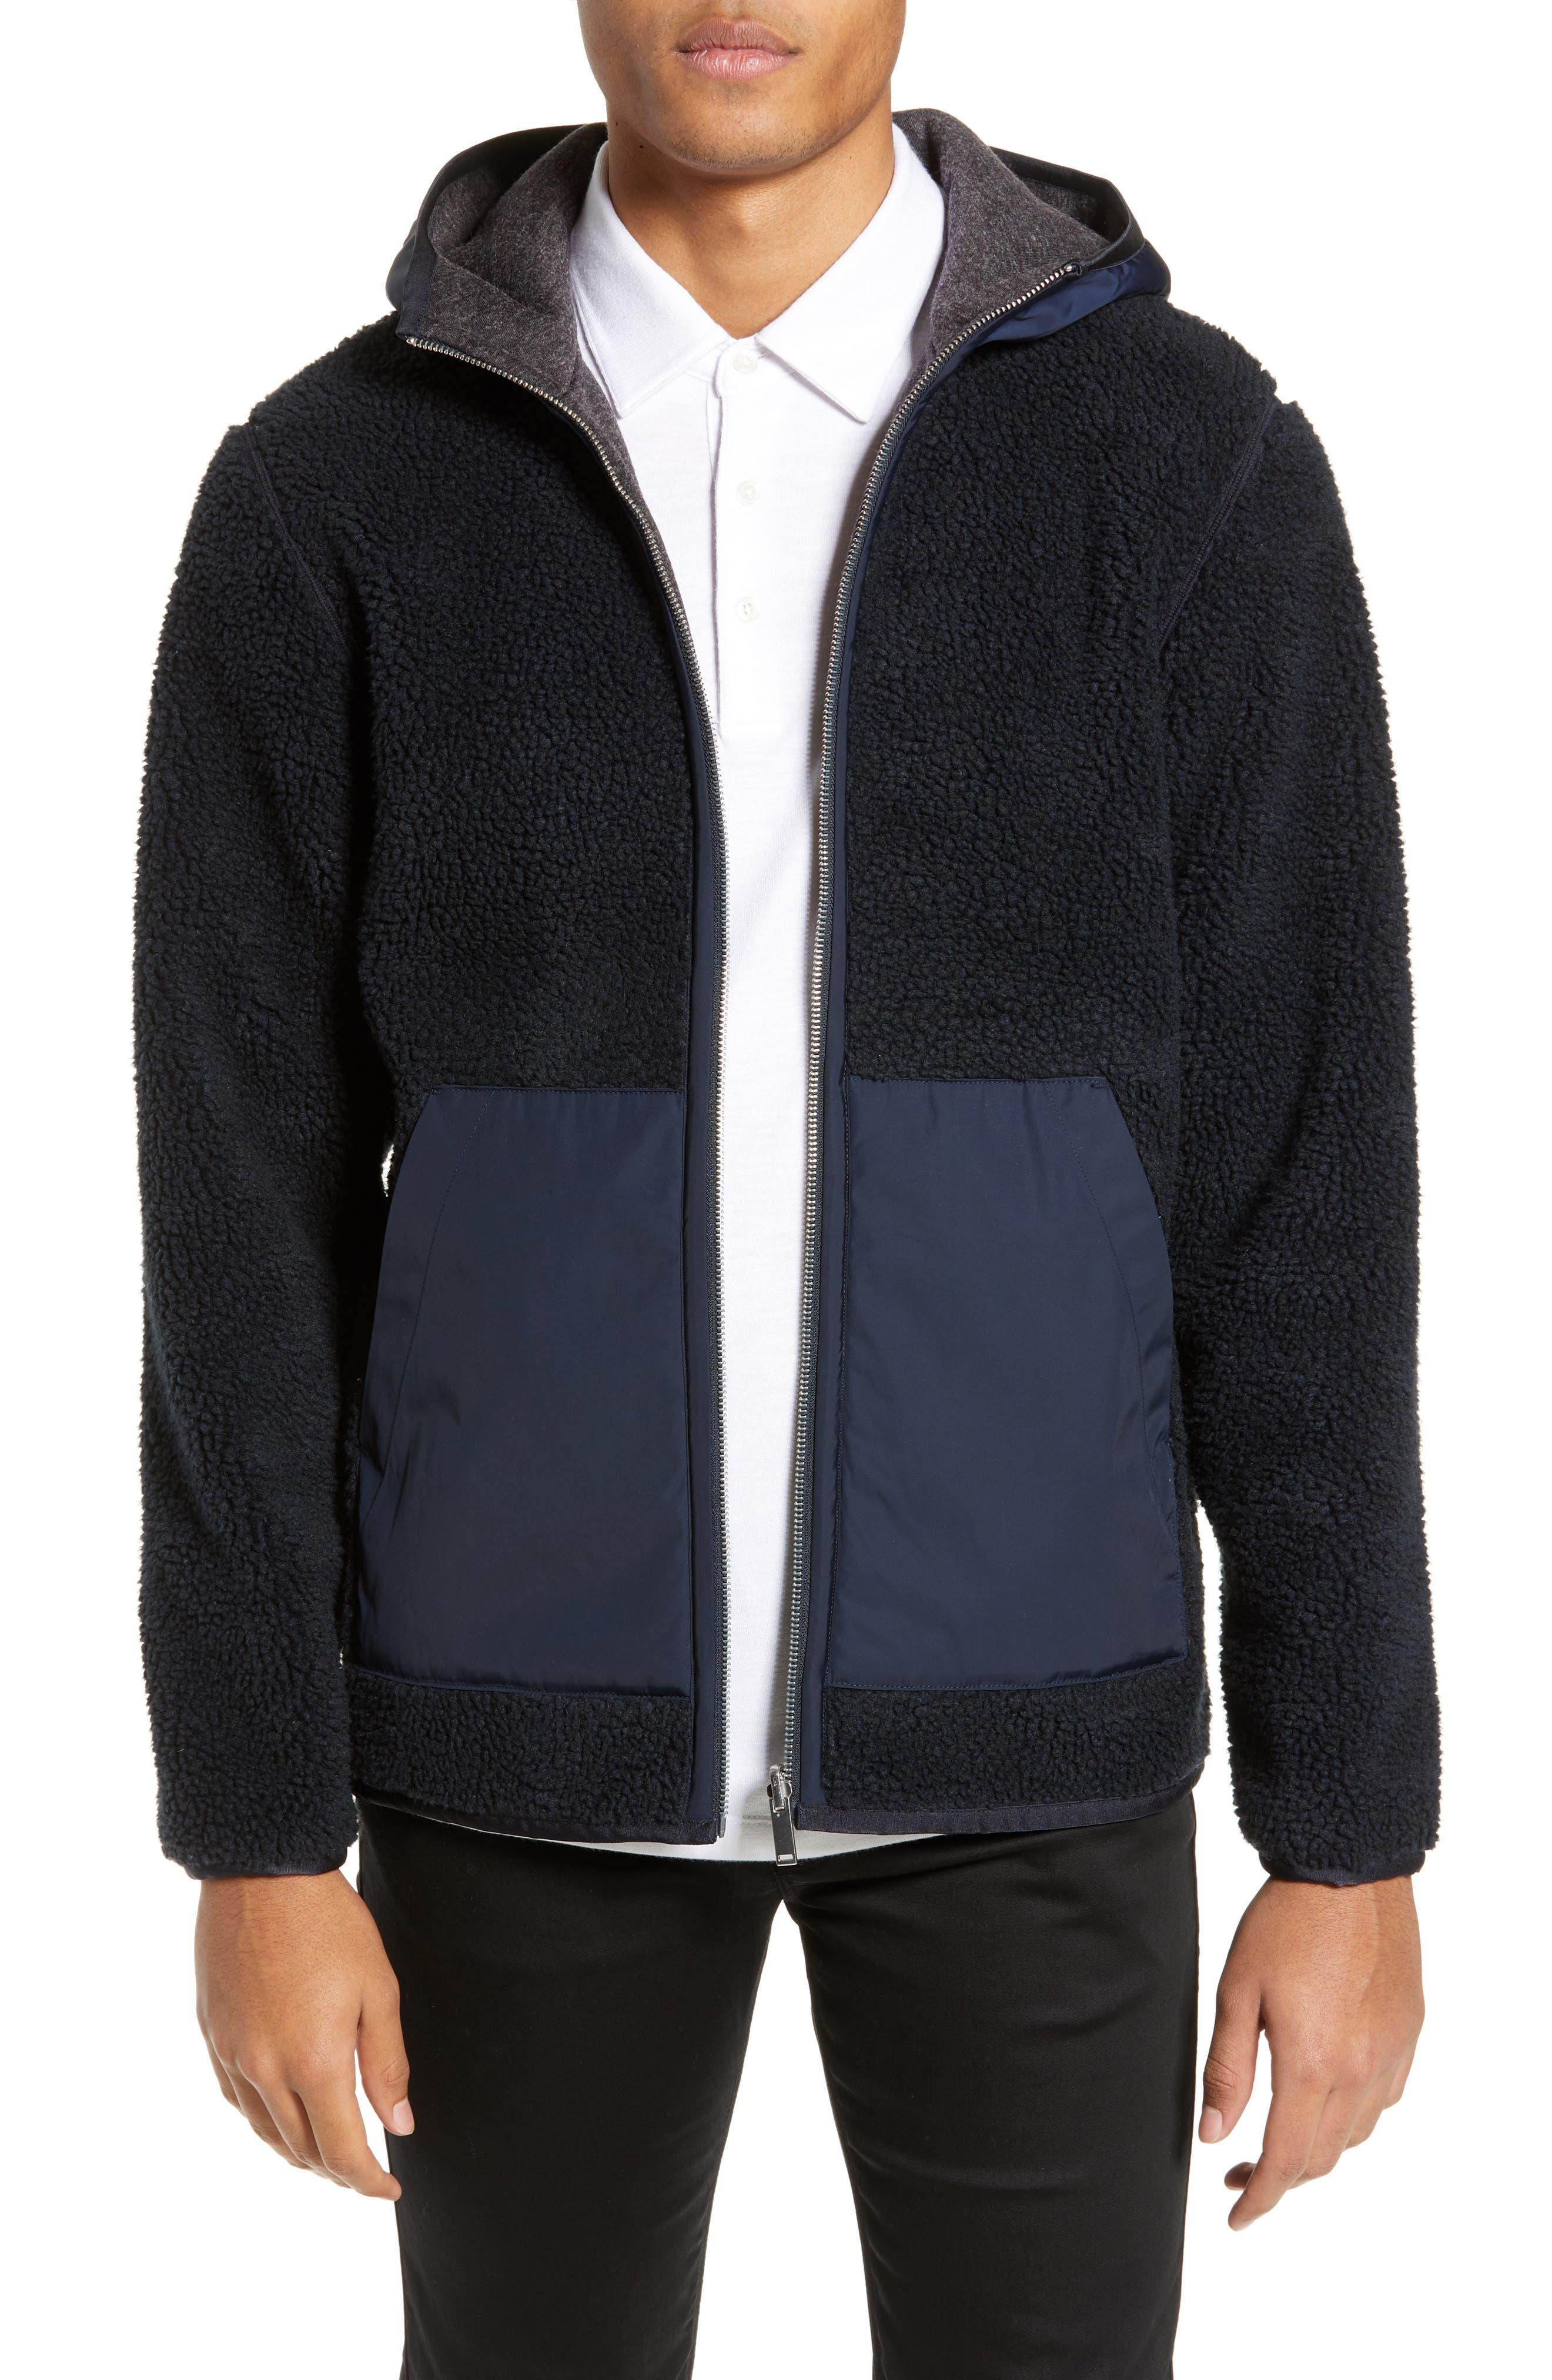 THEORY, Polar Fleece Reversible Zip Hoodie, Main thumbnail 1, color, 476